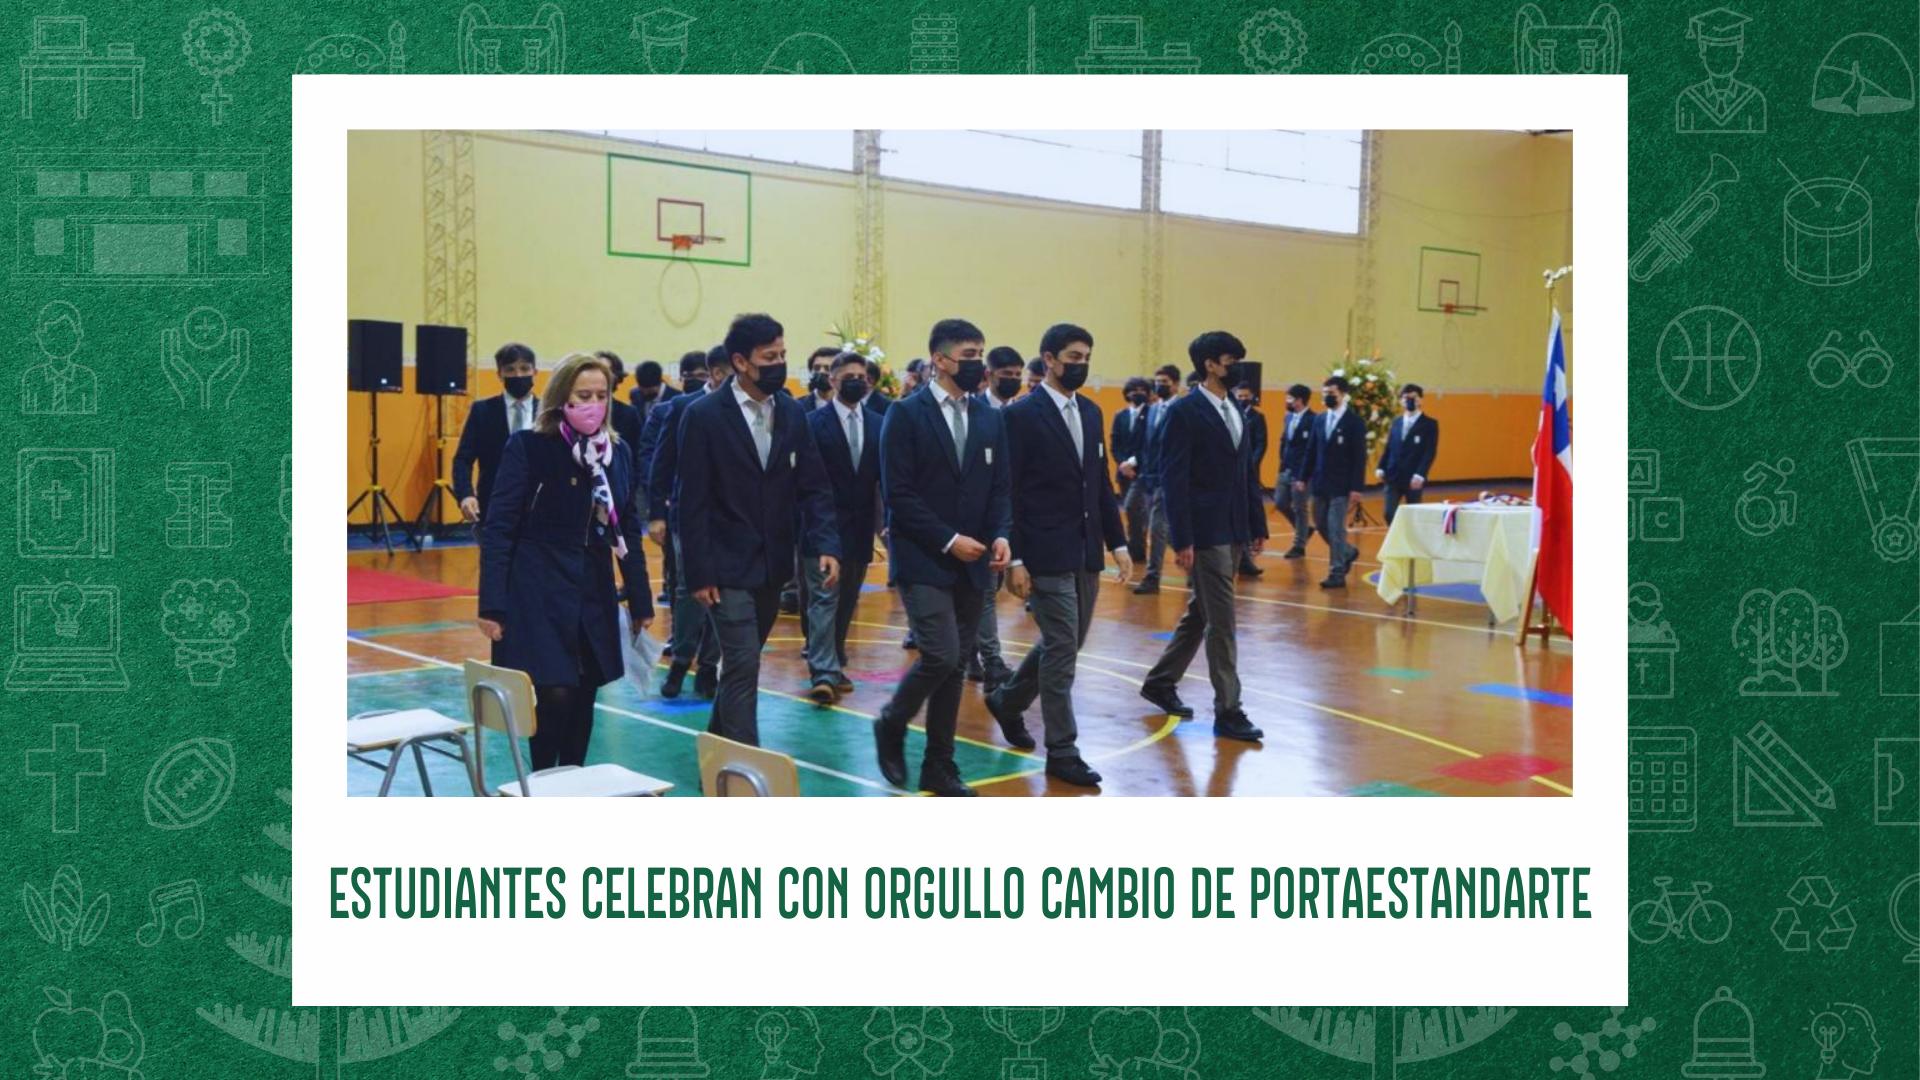 ESTUDIANTES CELEBRAN CON ORGULLO CAMBIO DE PORTAESTANDARTE